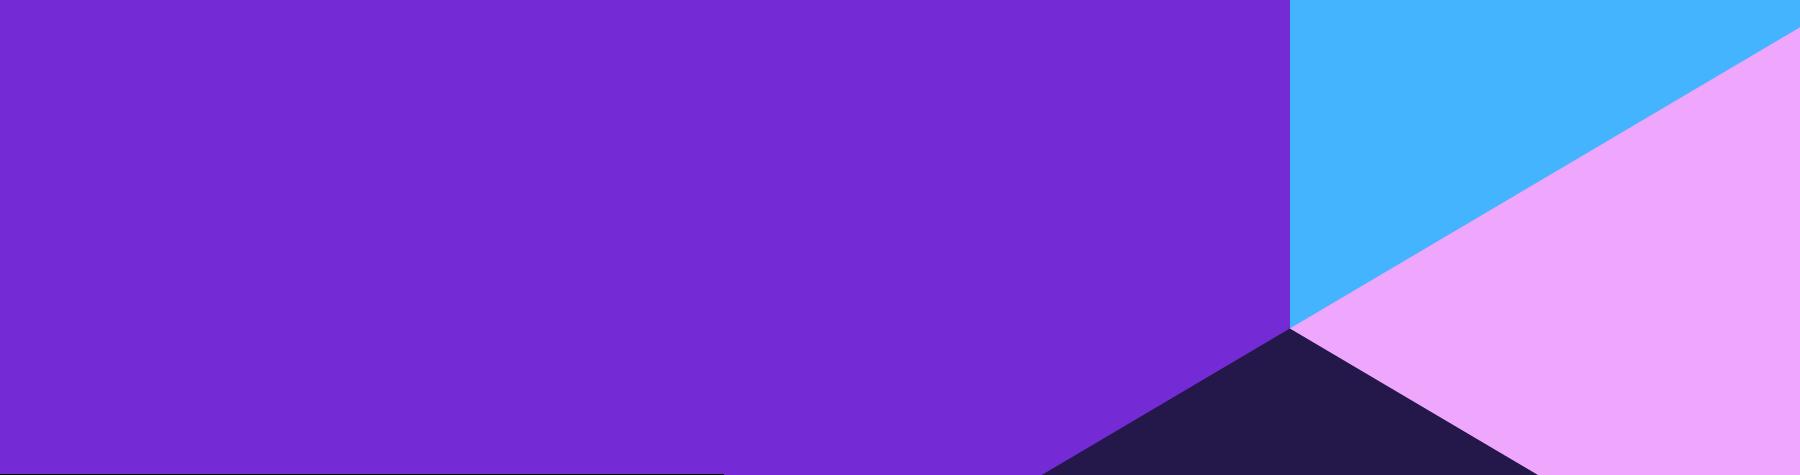 app-integrations-banner.png